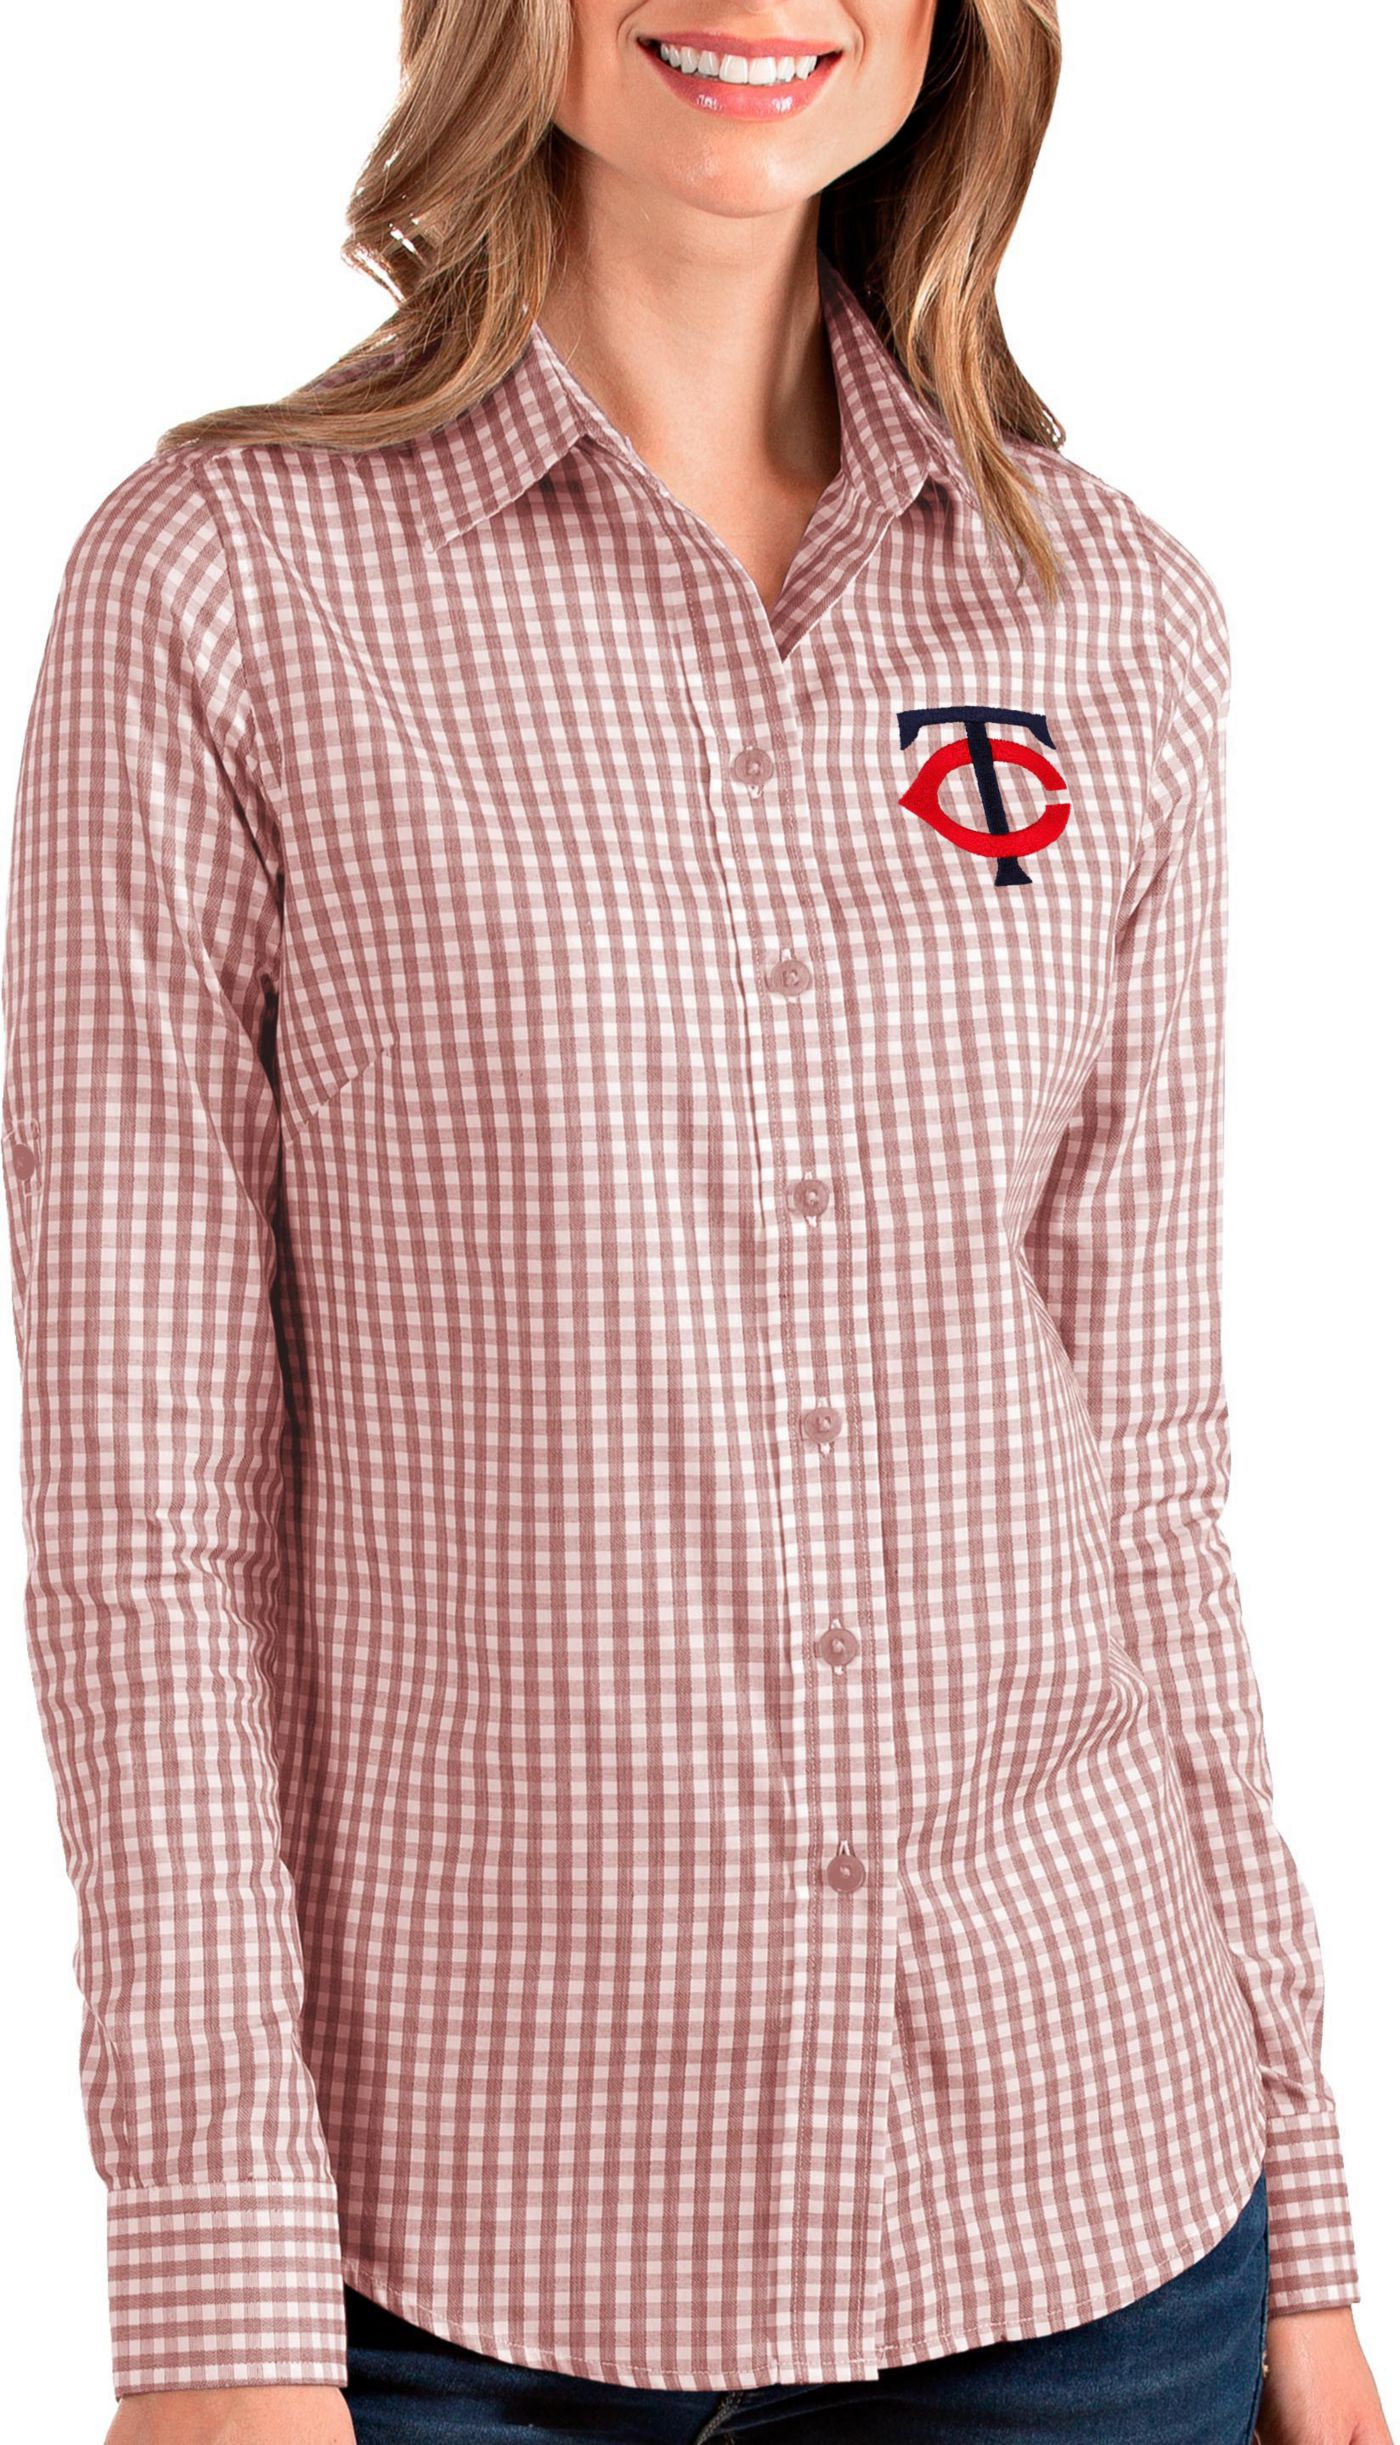 Antigua Women's Minnesota Twins Structure Button-Up Red Long Sleeve Shirt